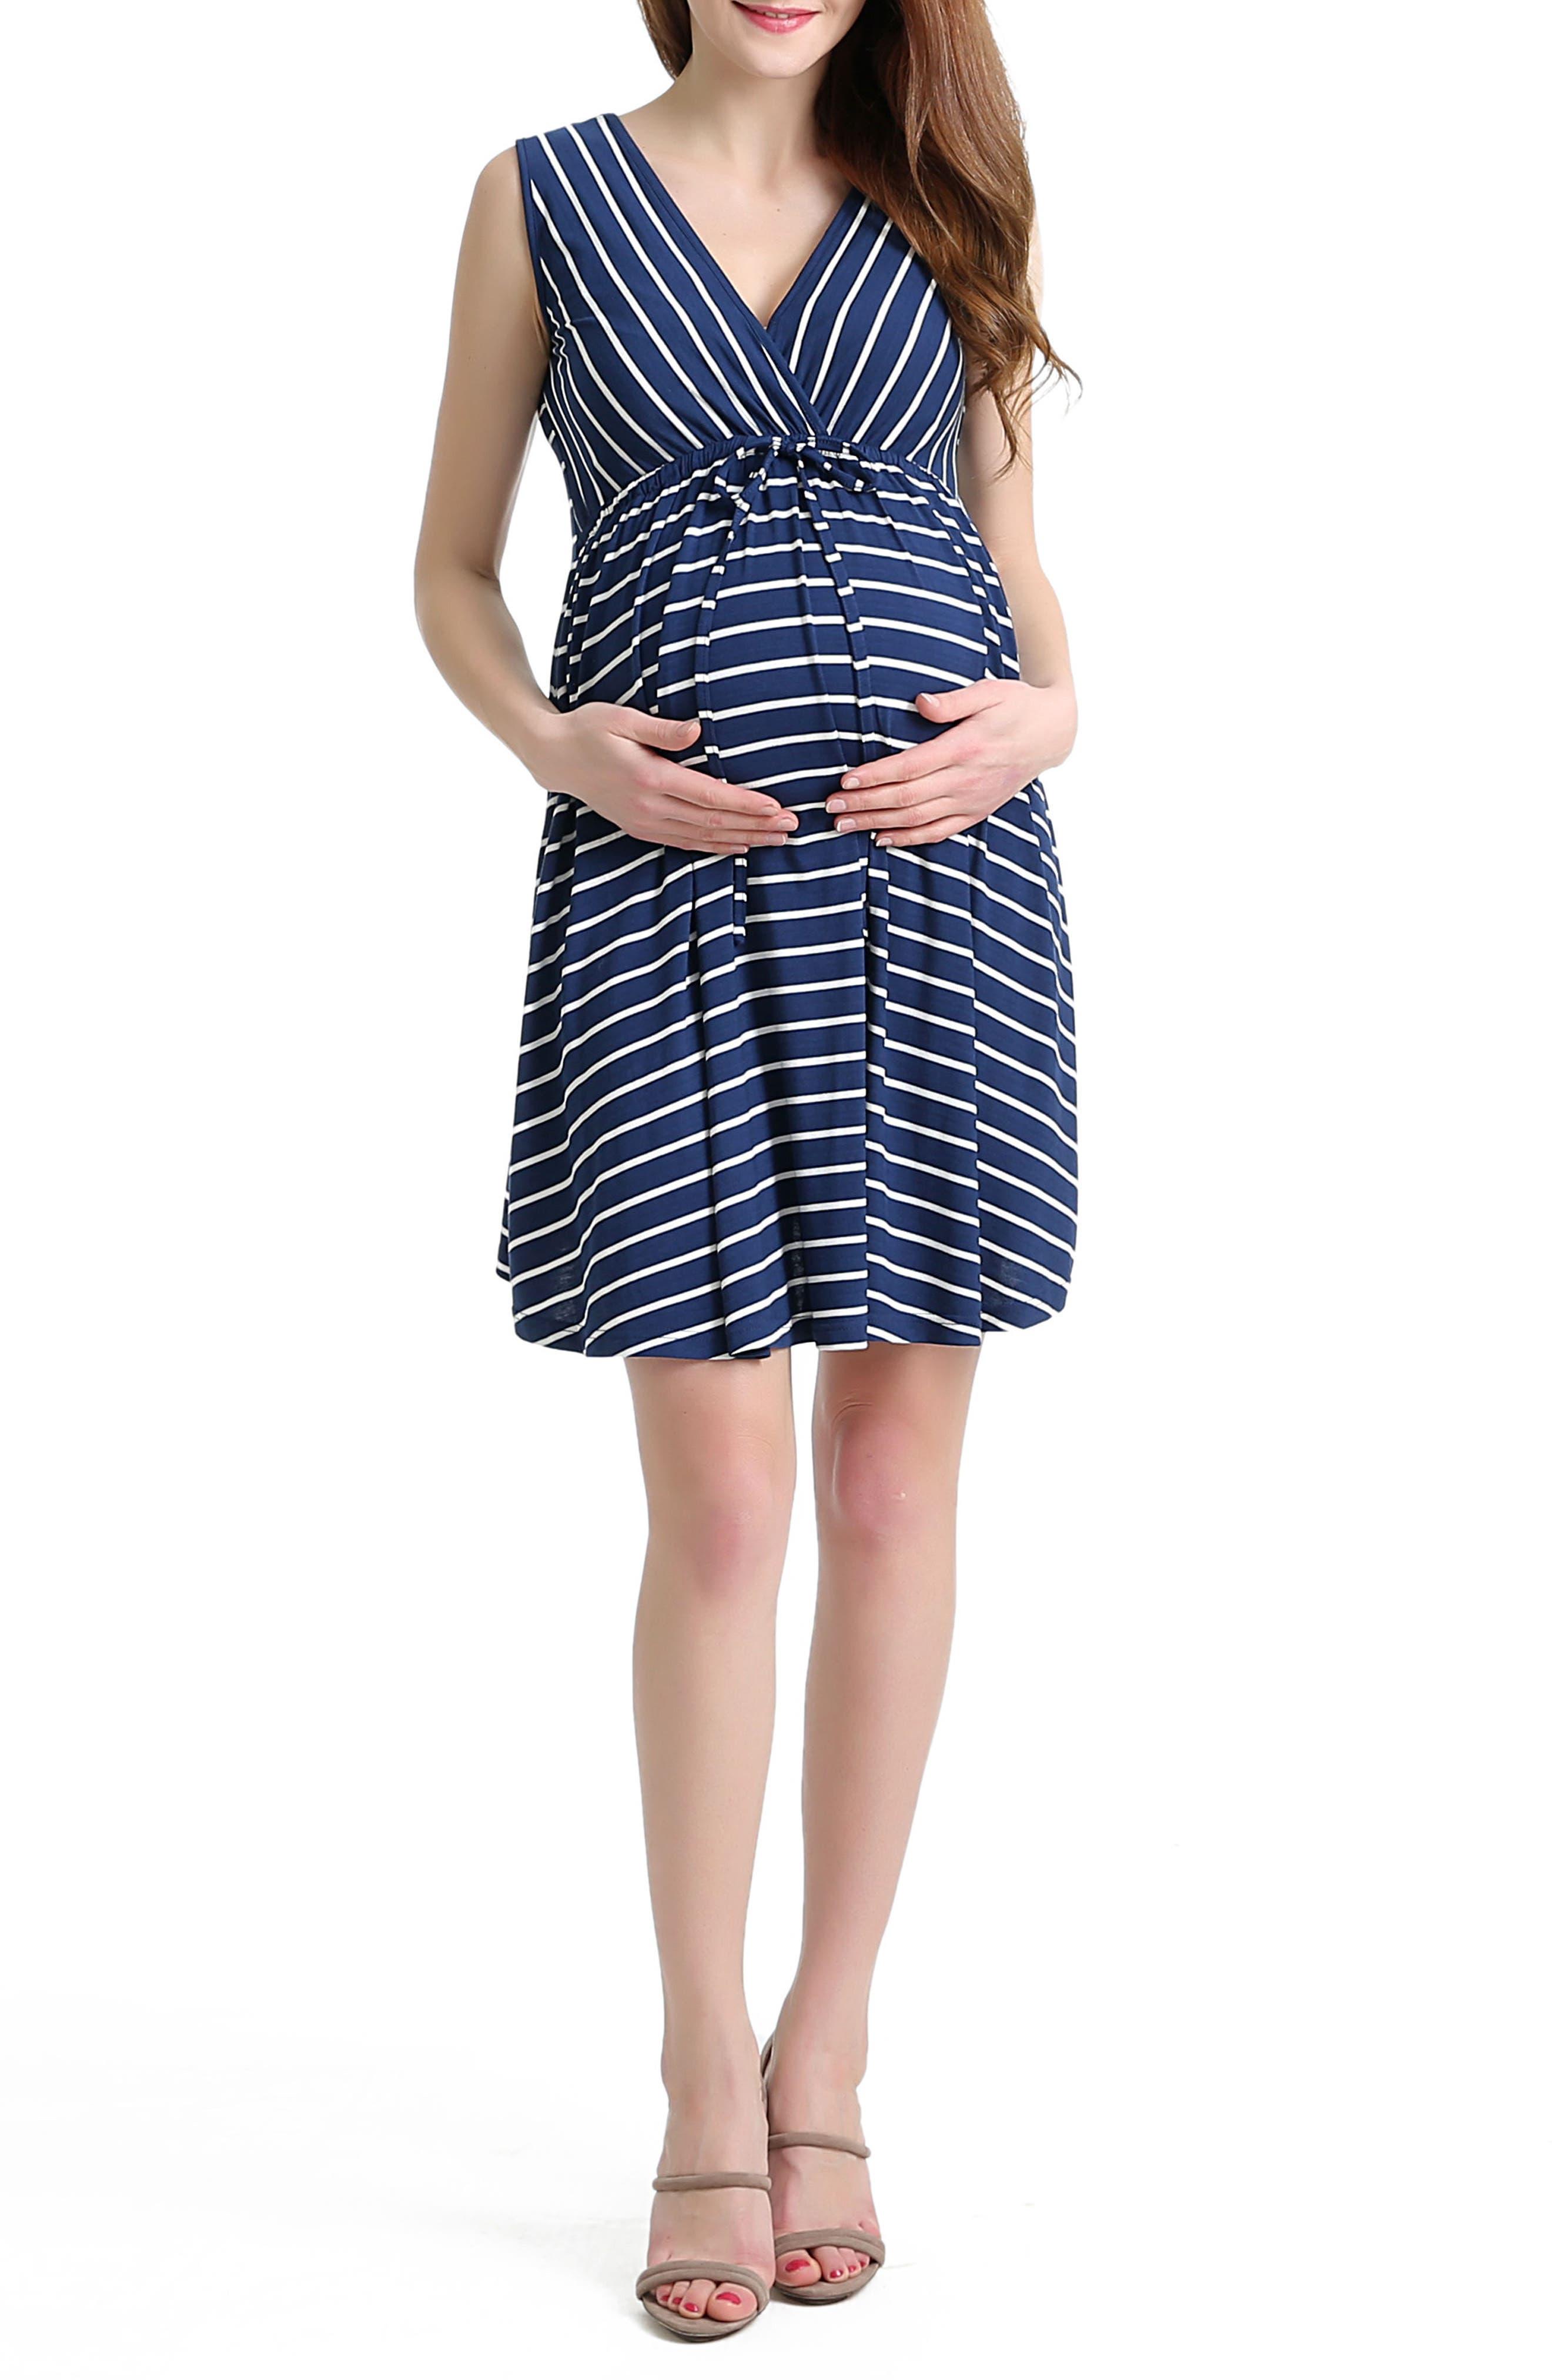 Nora Stripe Maternity Dress,                             Alternate thumbnail 4, color,                             400